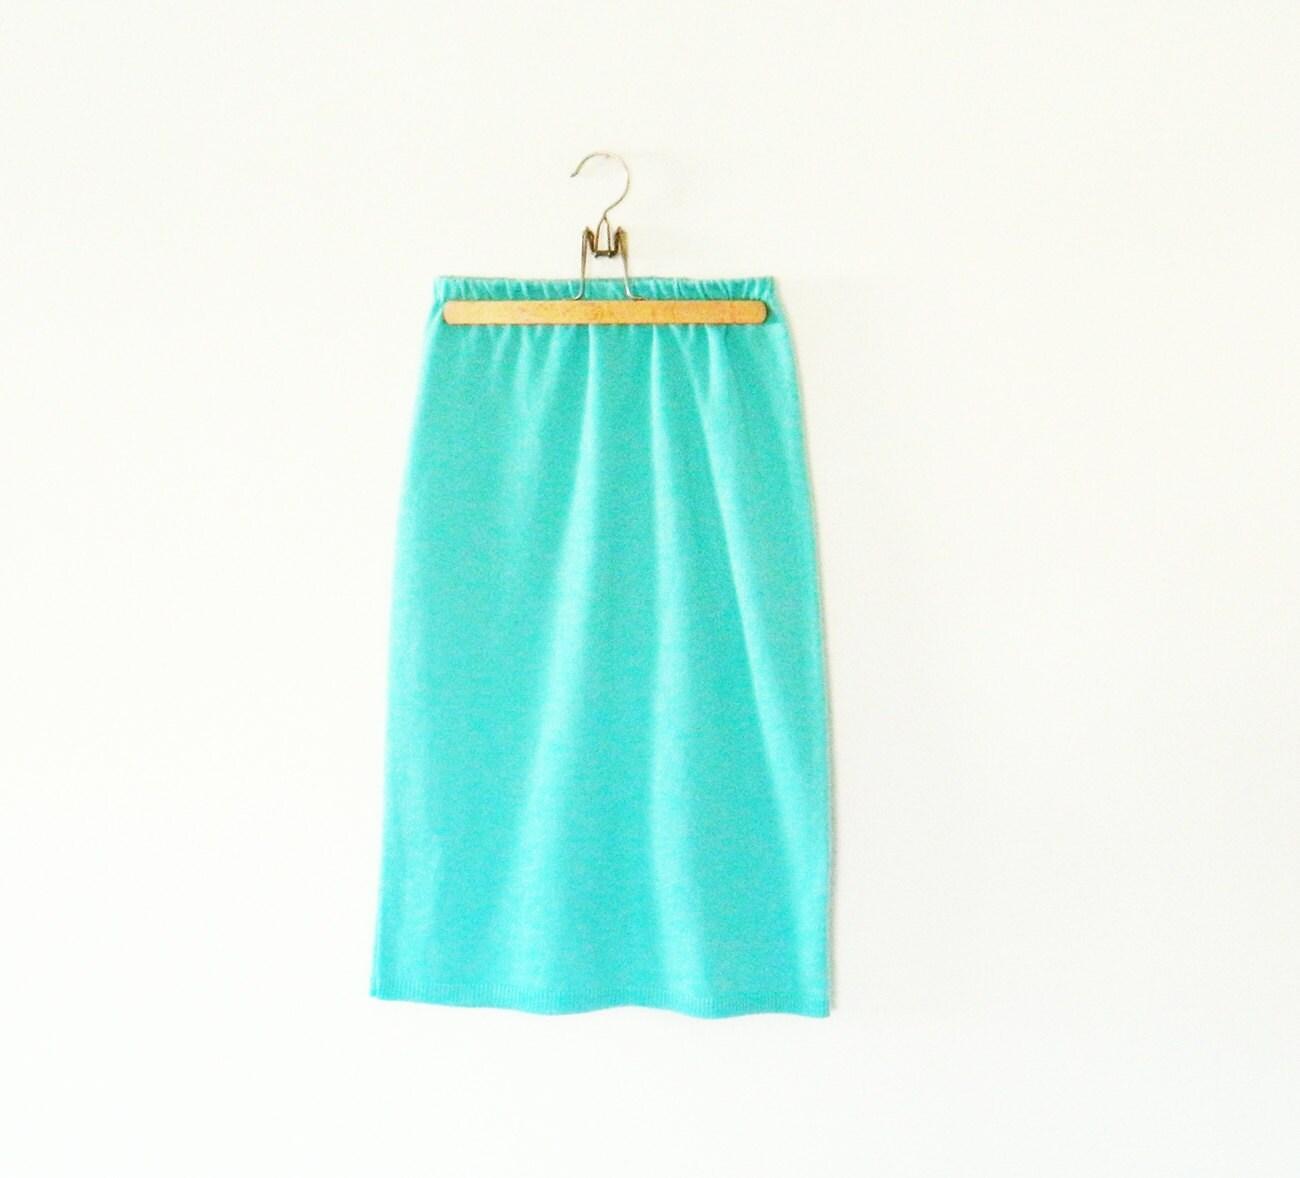 mint green vintage knit sweater skirt cozy knit pencil skirt